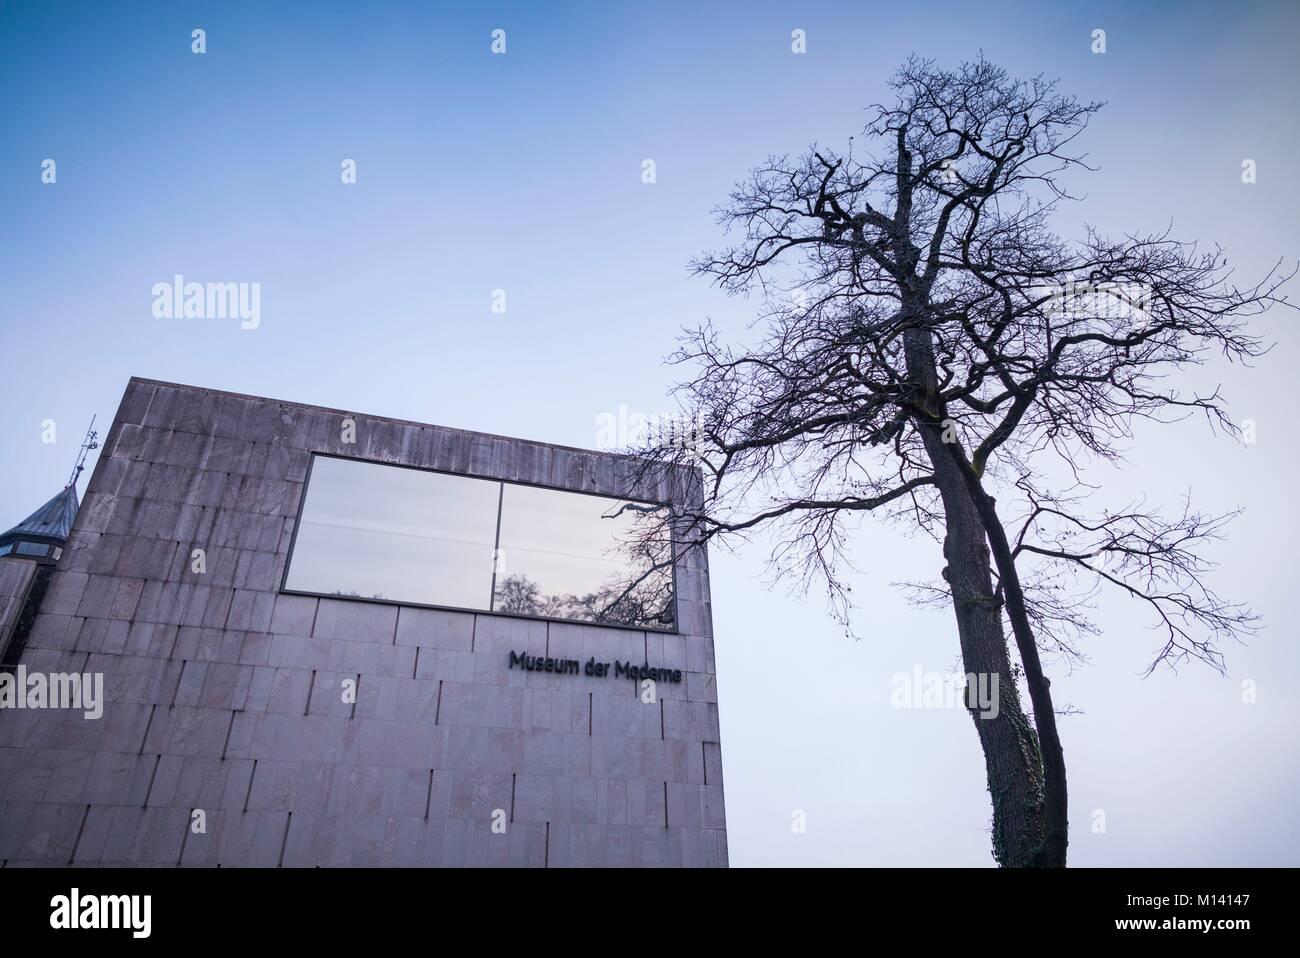 Austria, Salzburgerland, Salzburg, Museum der Moderne Monchsberg, modern art museum, exterior Stock Photo